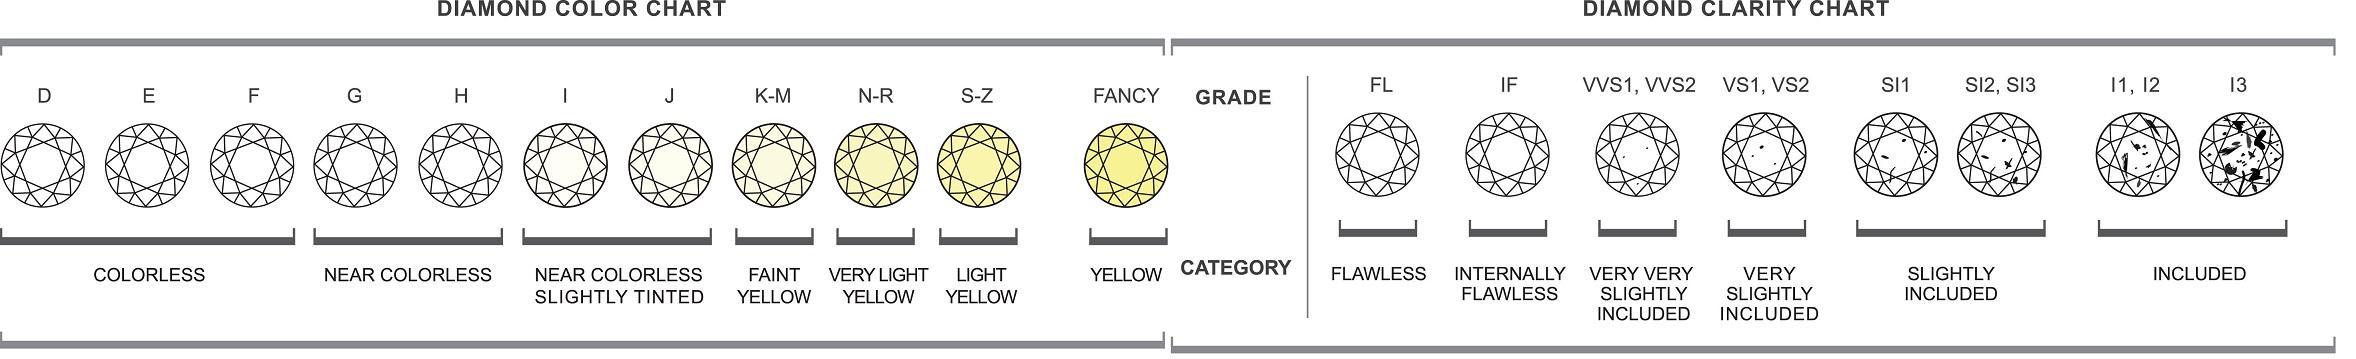 clarity chart for diamonds